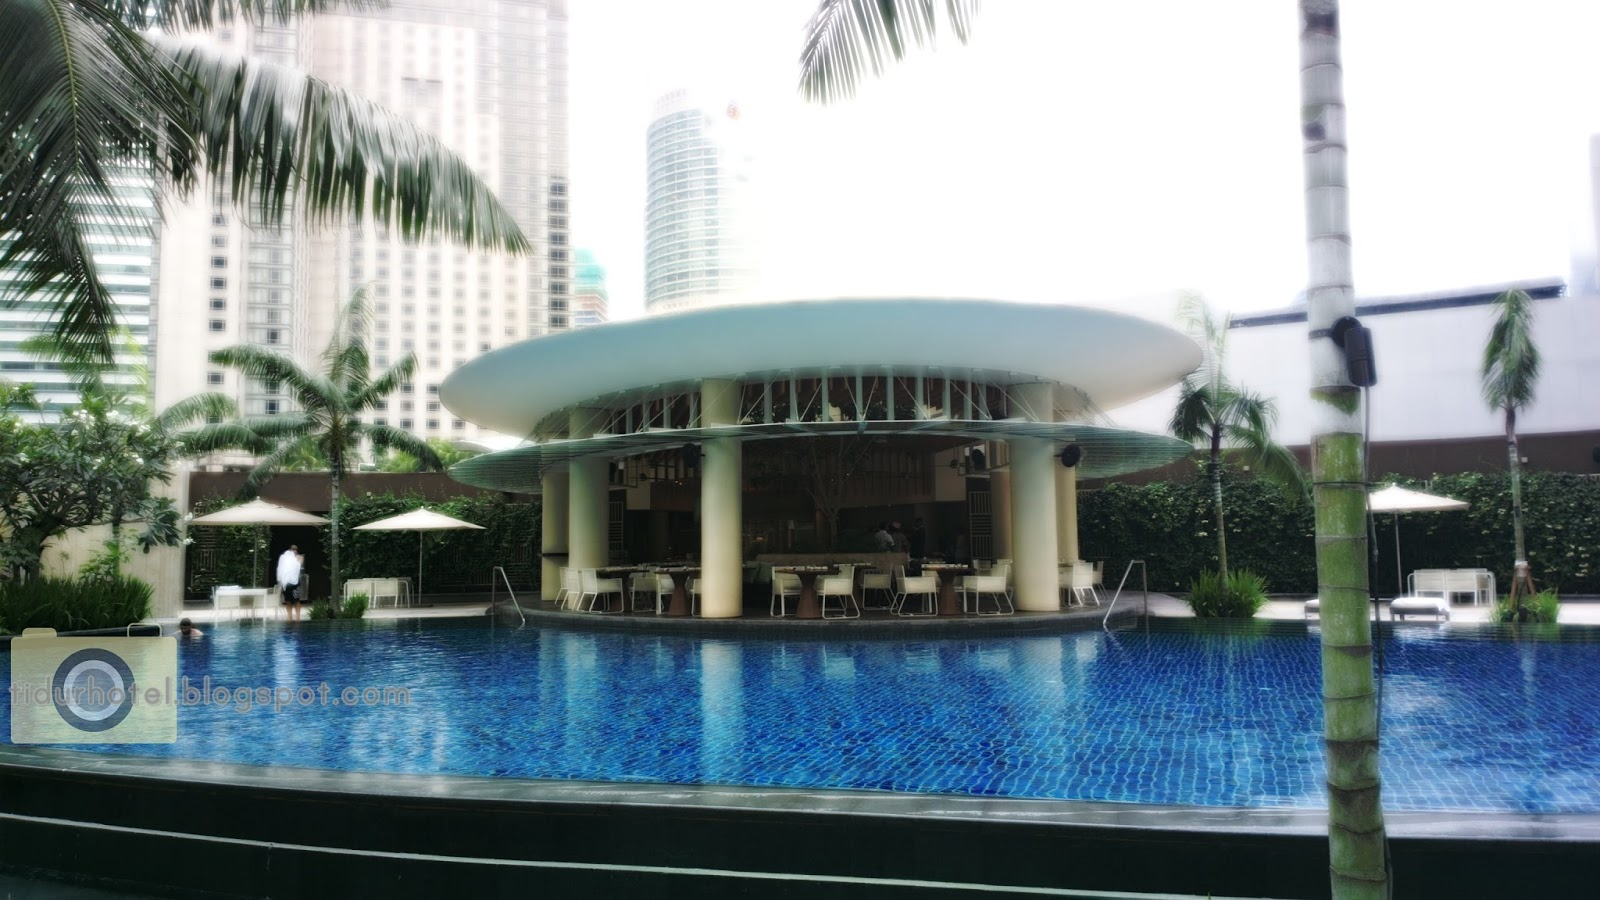 Jalan jalan makan makan grand hyatt kuala lumpur best hotel to stay in for Best hotel swimming pool in kuala lumpur